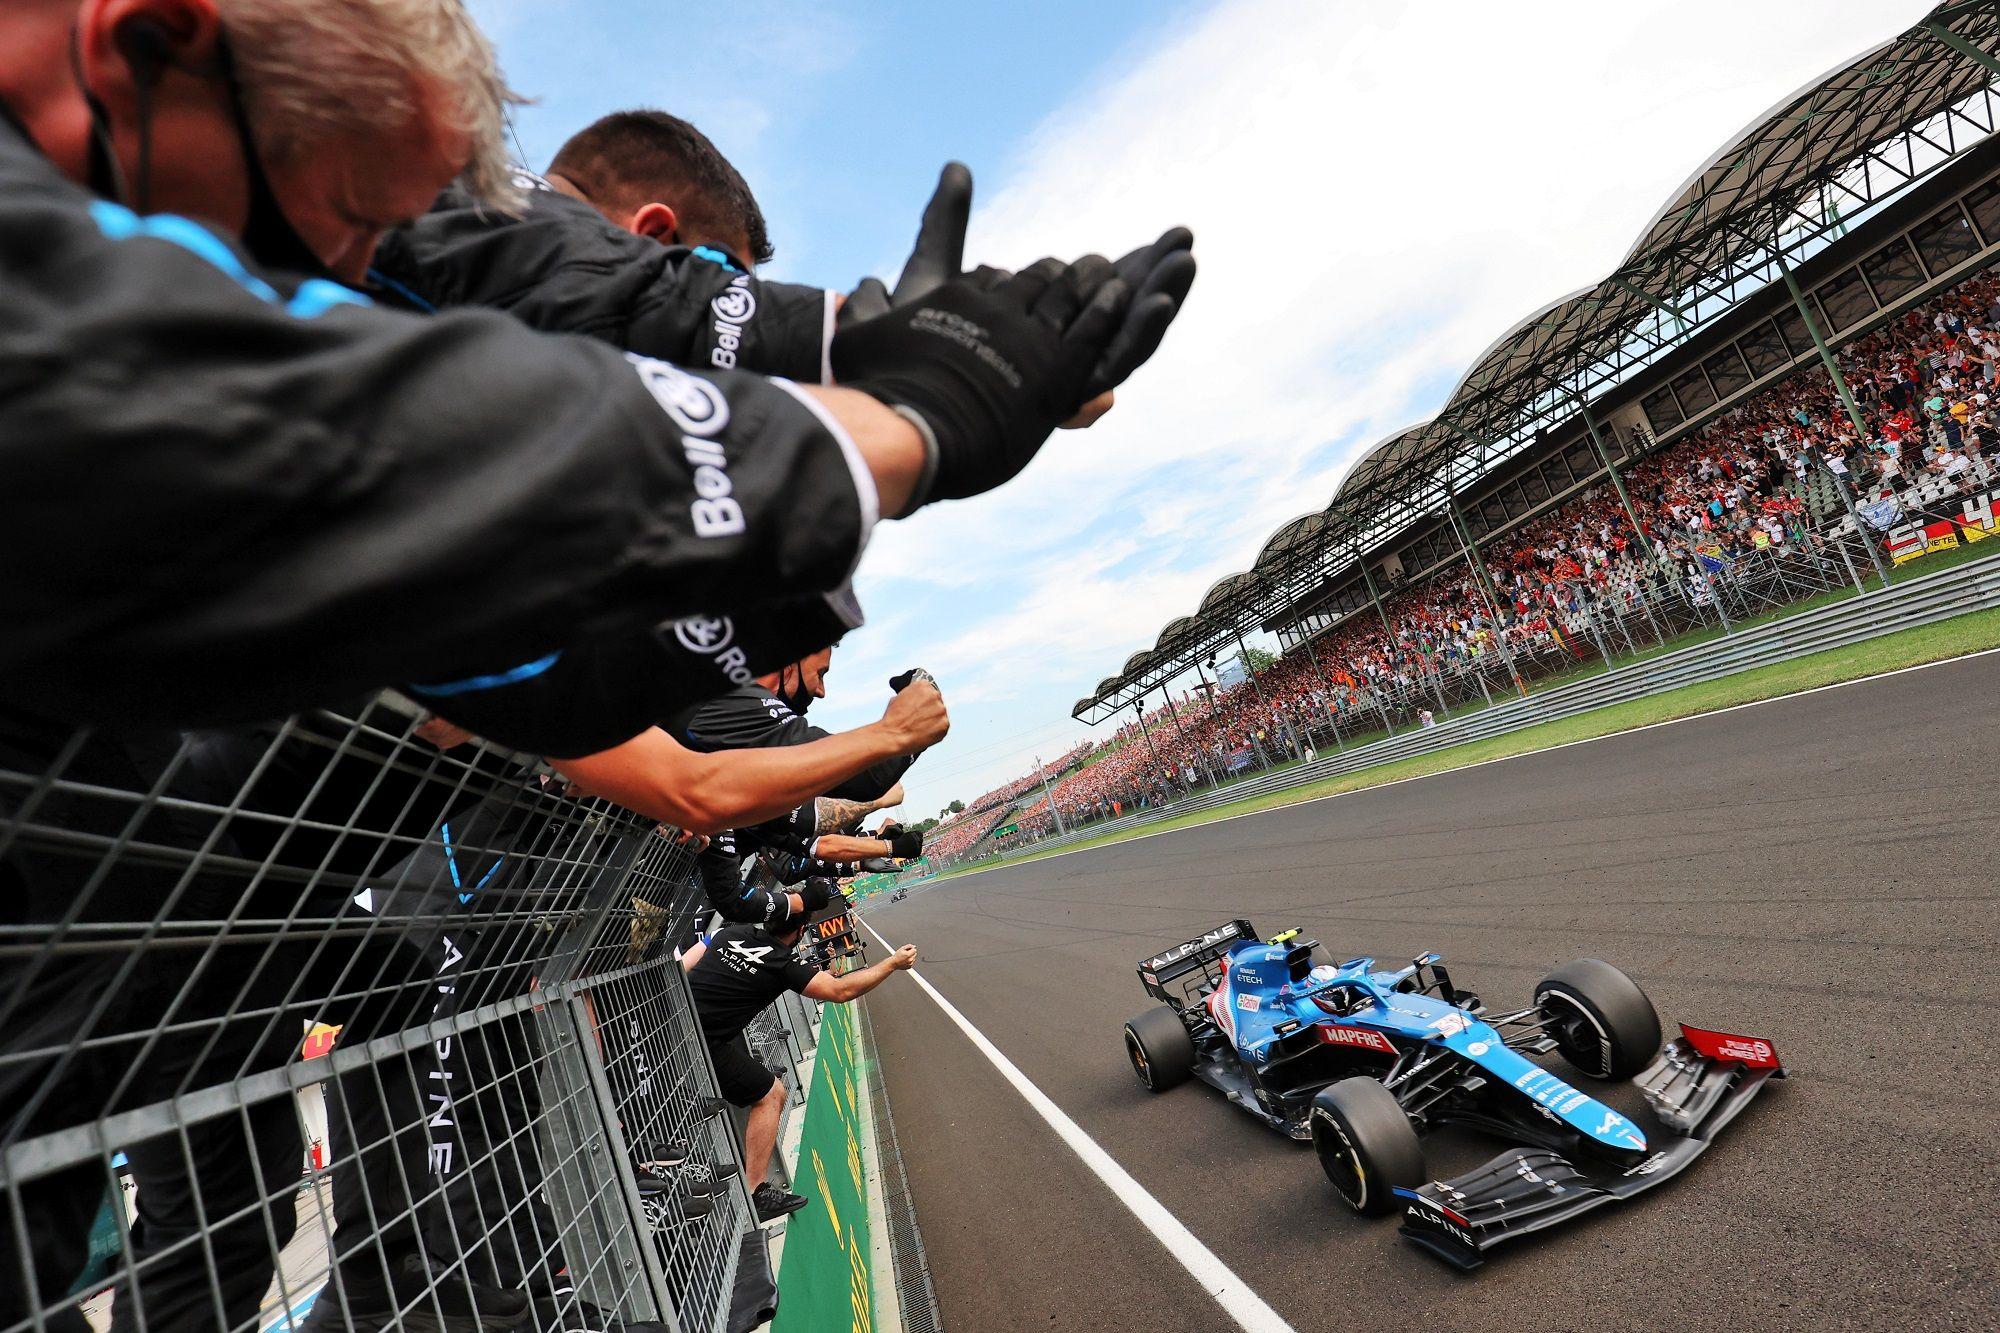 F1, Esteban Ocon, Fernando Alonso, Lewis Hamilton